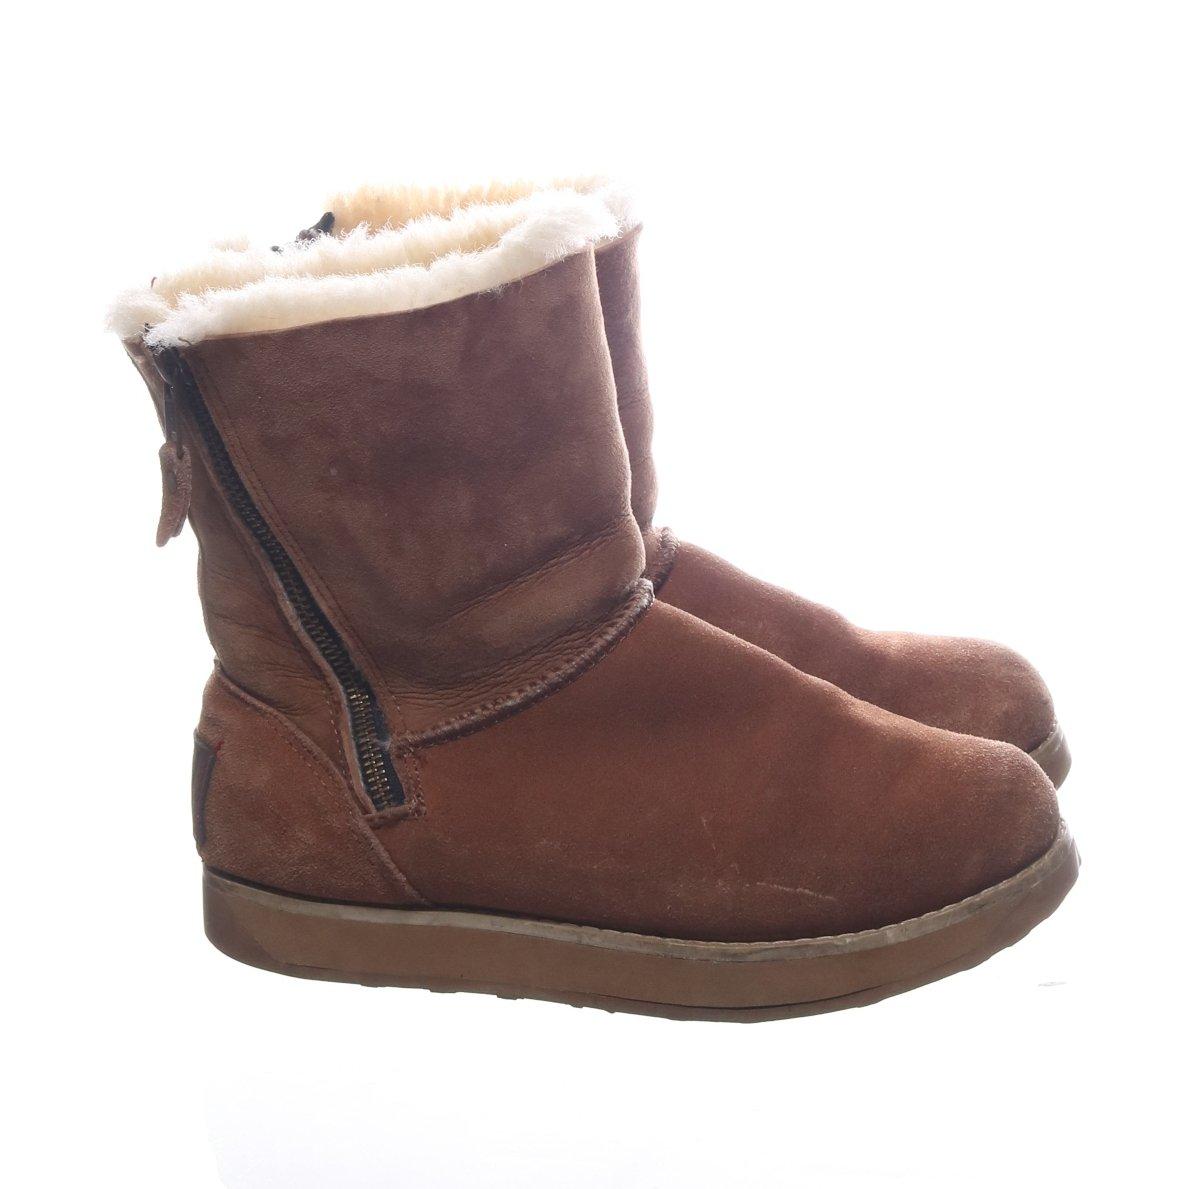 Canada Snow, Boots, Strl: 36, Brun, MockaSkinn